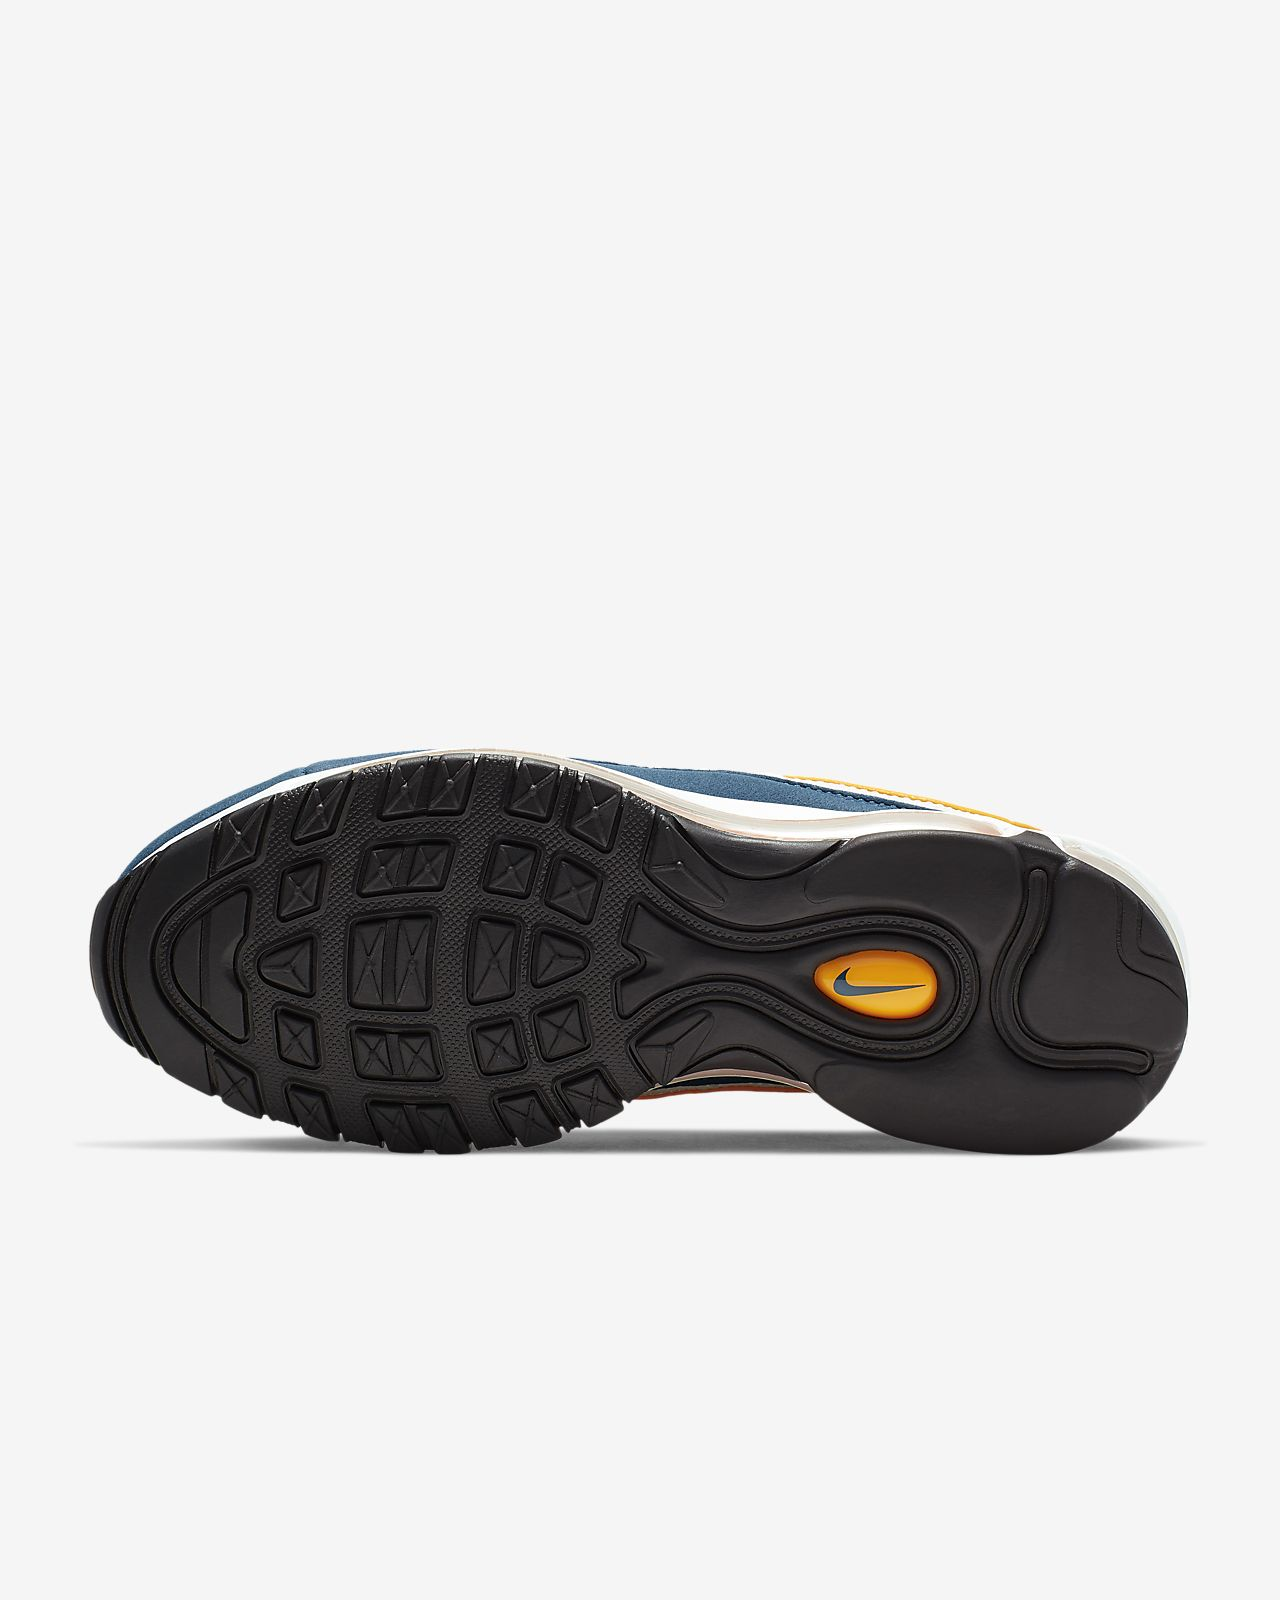 ffc9ab5bf Nike Air Max 98 Women s Shoe. Nike.com ZA